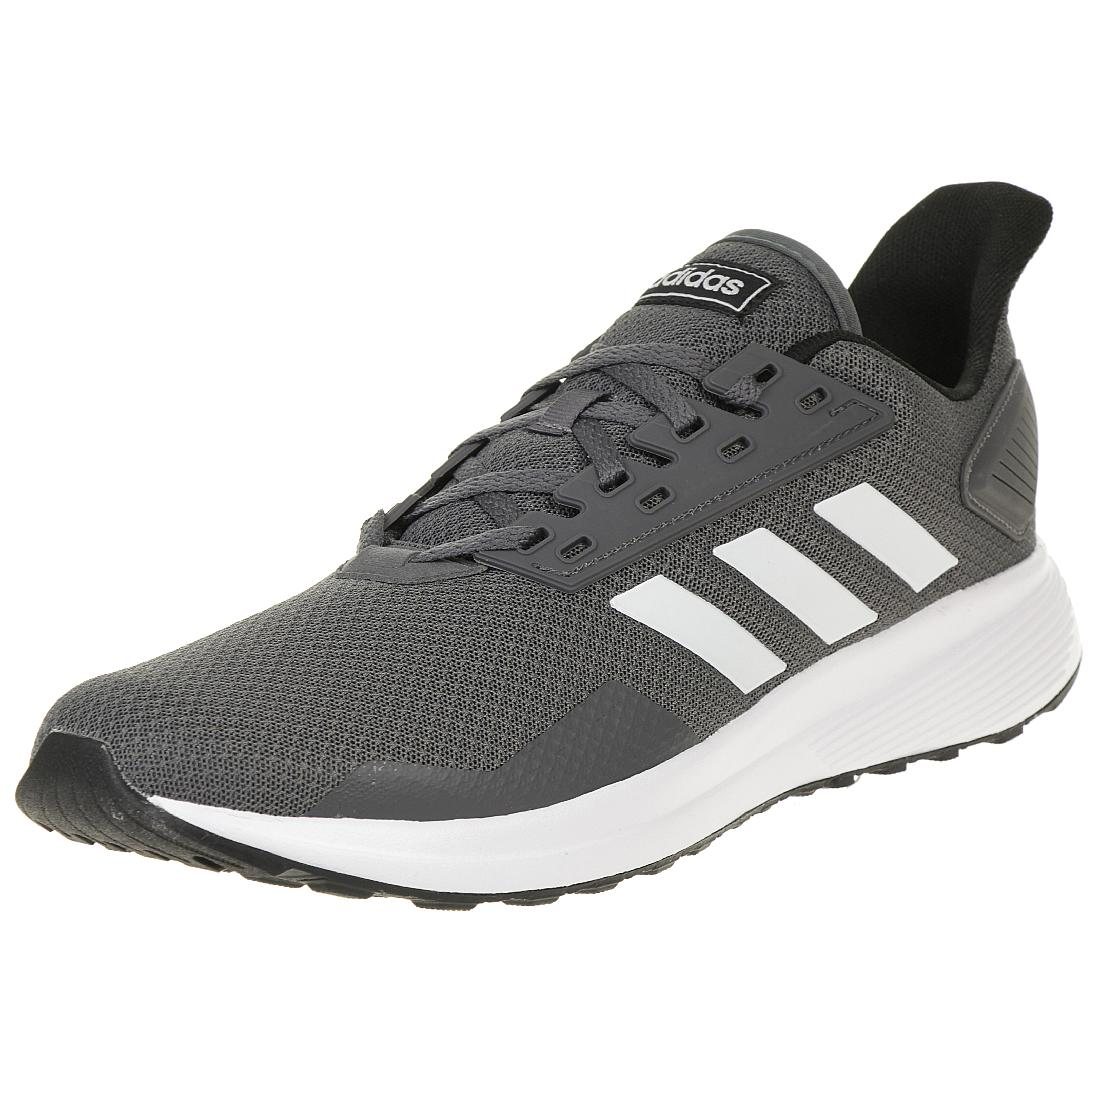 Adidas Duramo 9 Herren Laufschuh Sportschuh Jogging Running